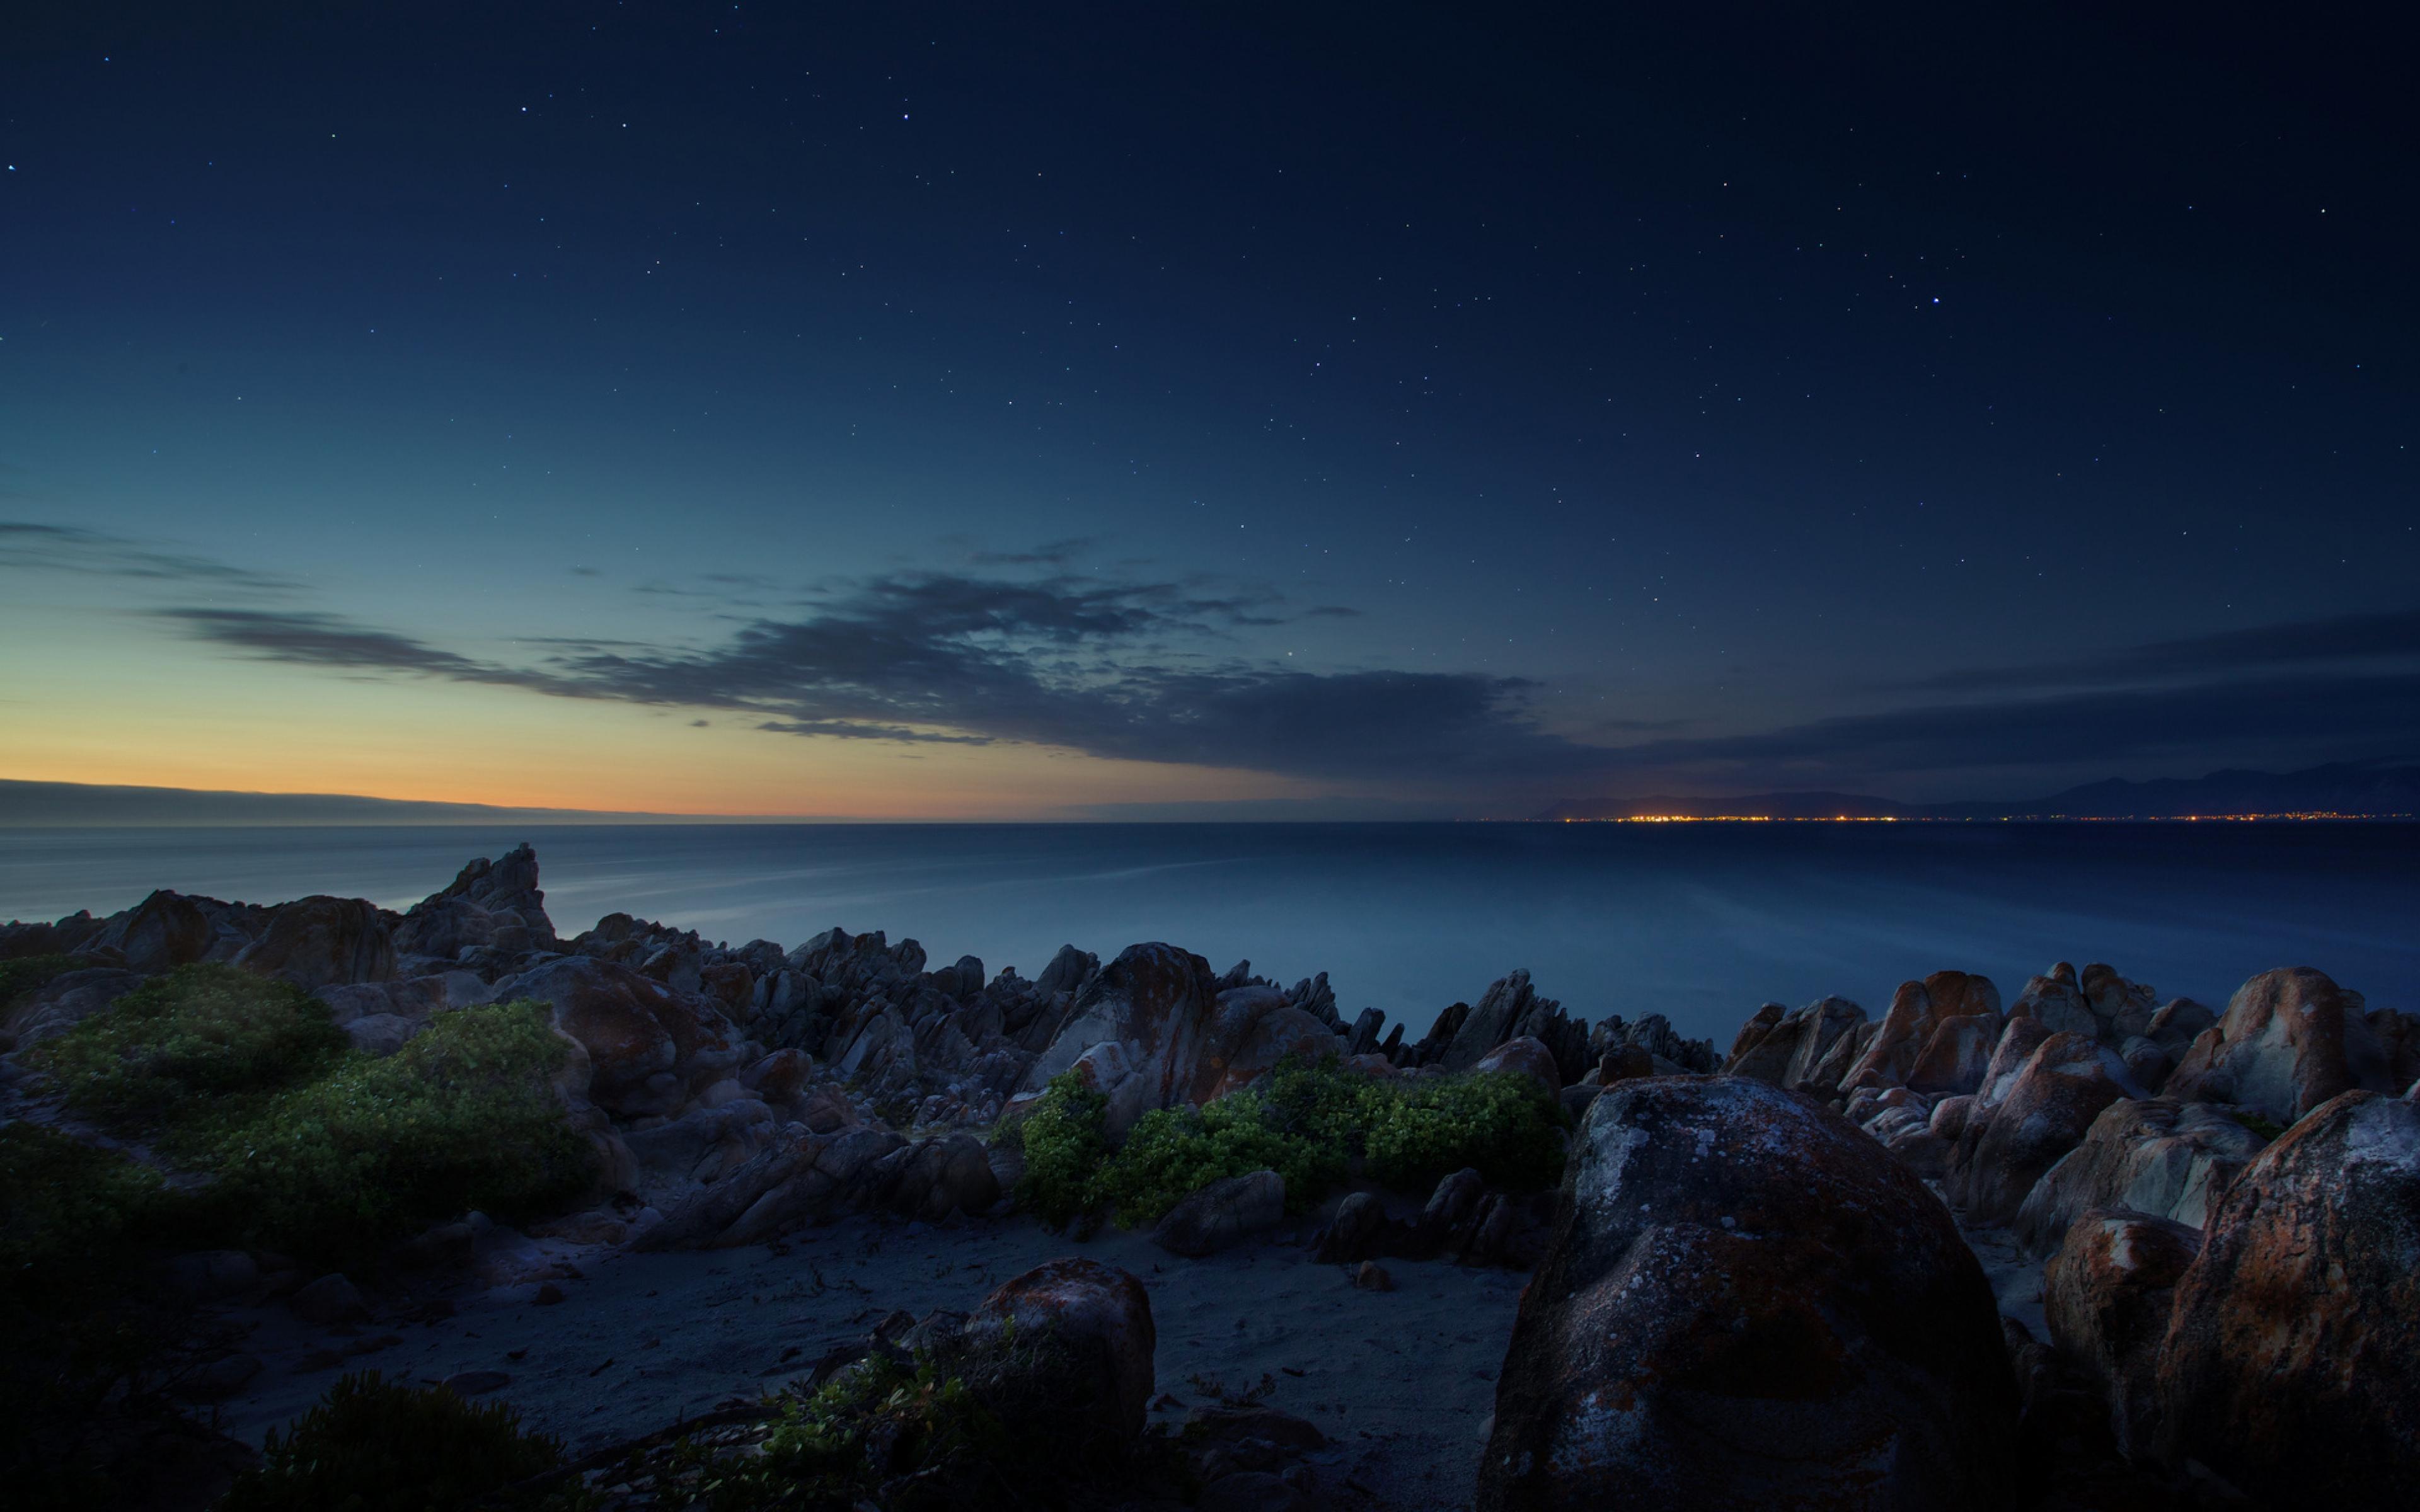 Download Wallpaper 3840x2400 South africa Ocean Night Beach Stones 3840x2400